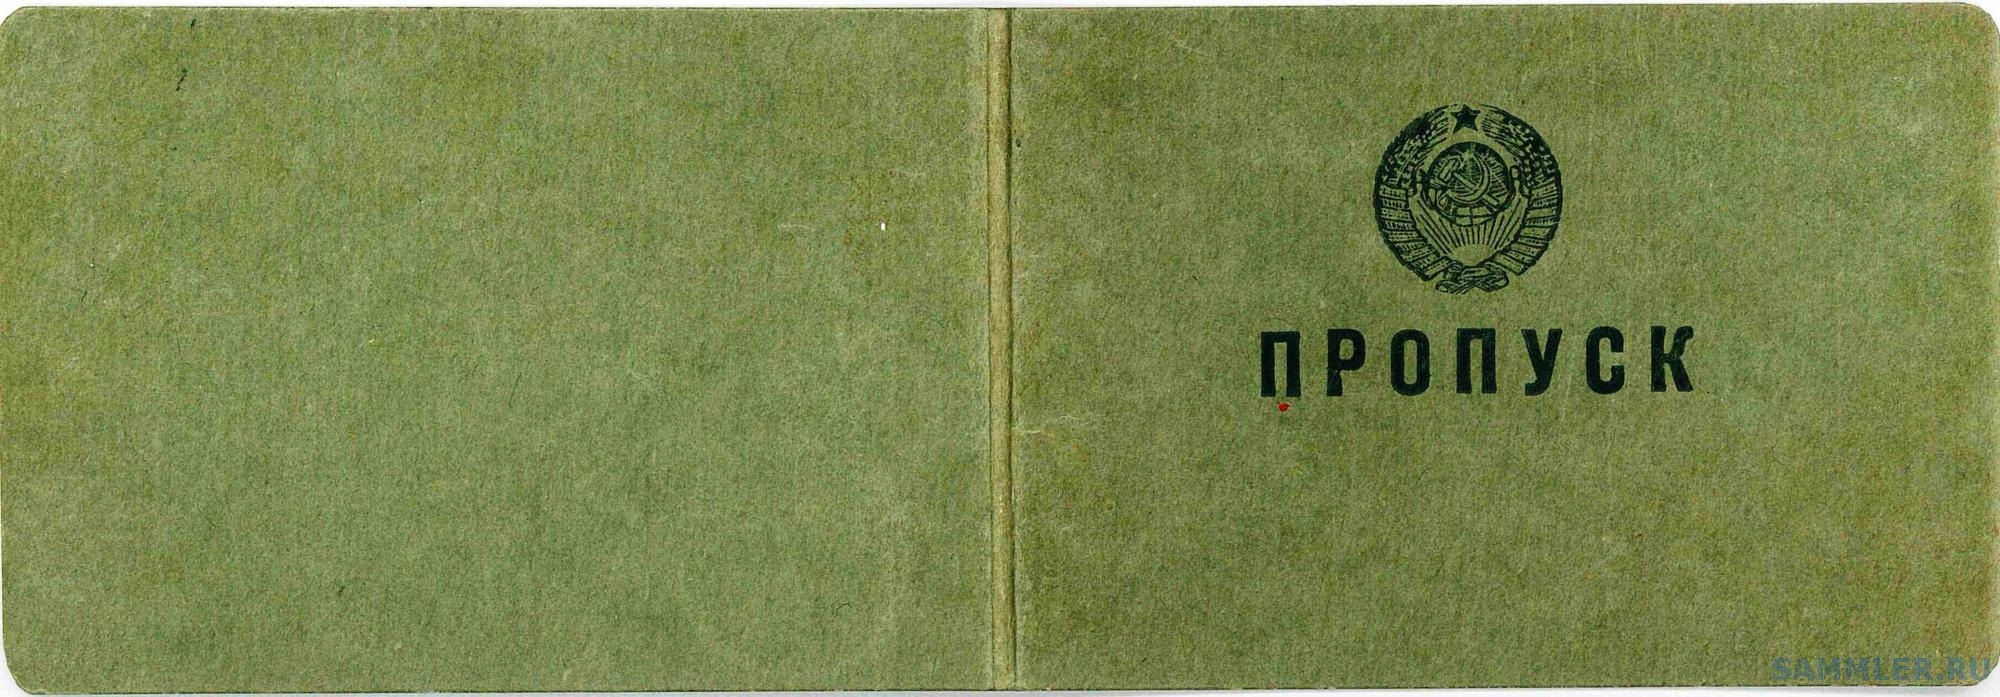 Пропуск НКГБ СССР 1474 Степануха Прокофий Петрович-1.jpg